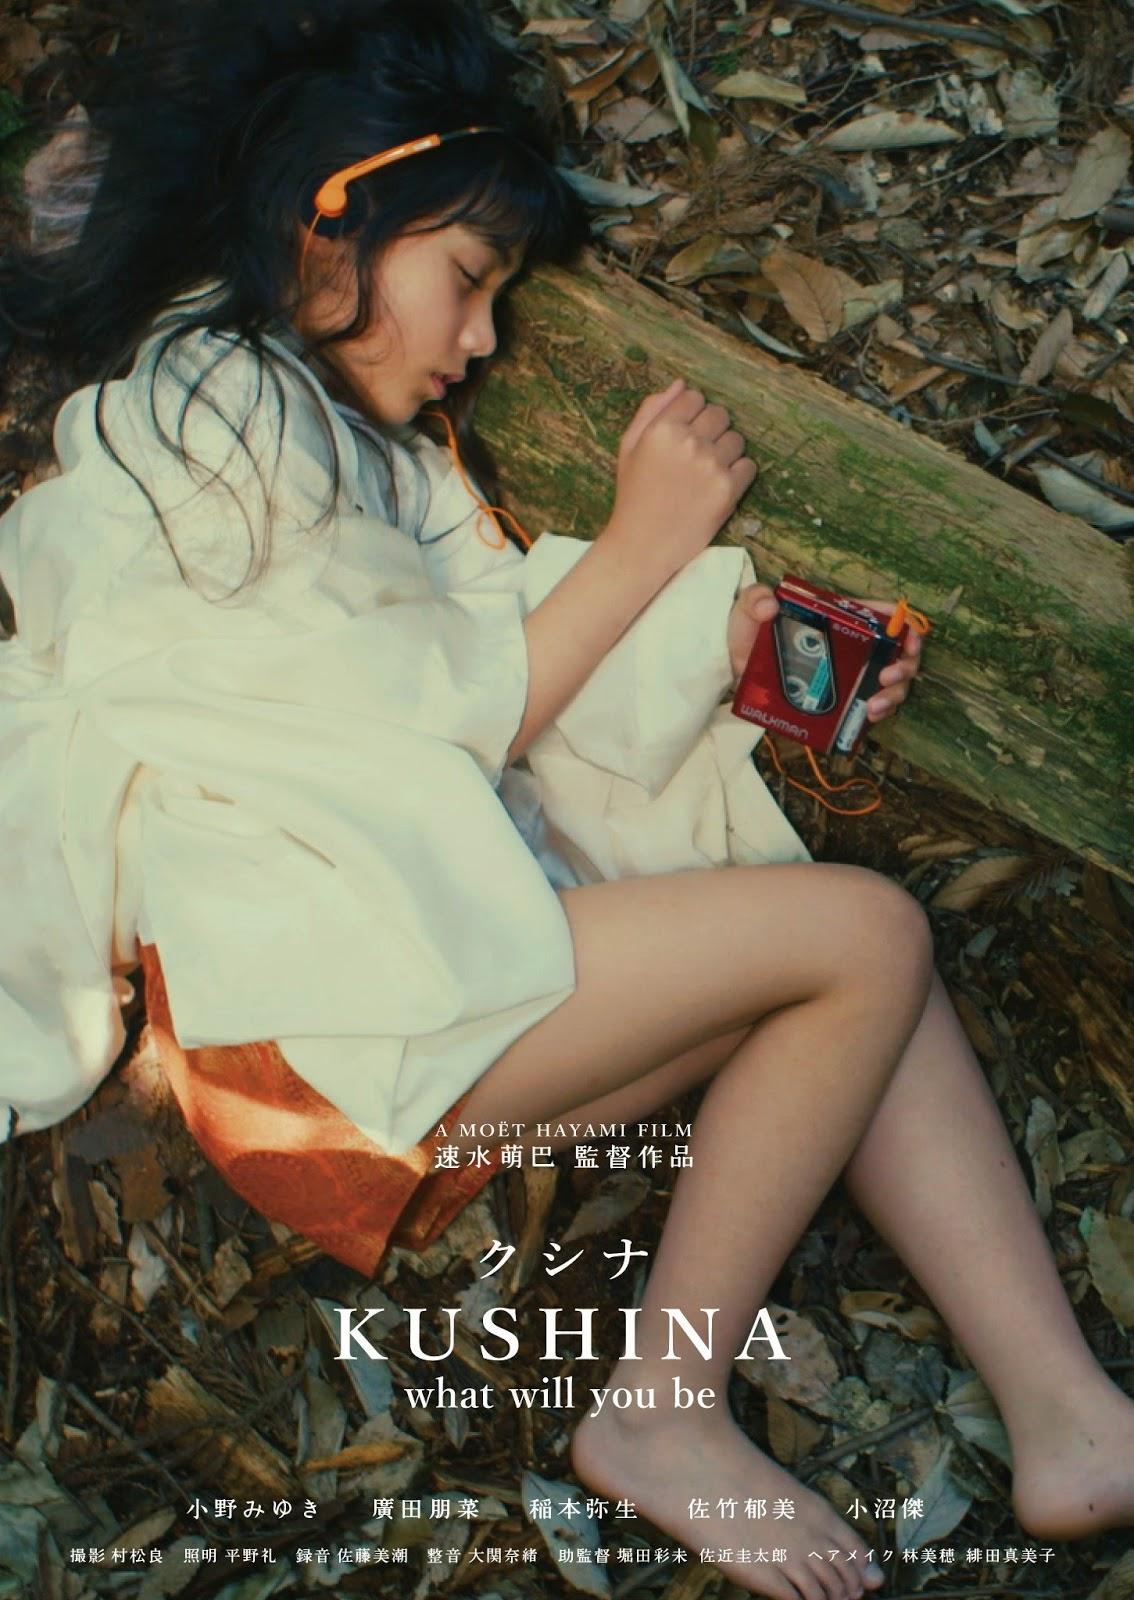 Kushina, What Will You Be film - Moët Hayami - poster